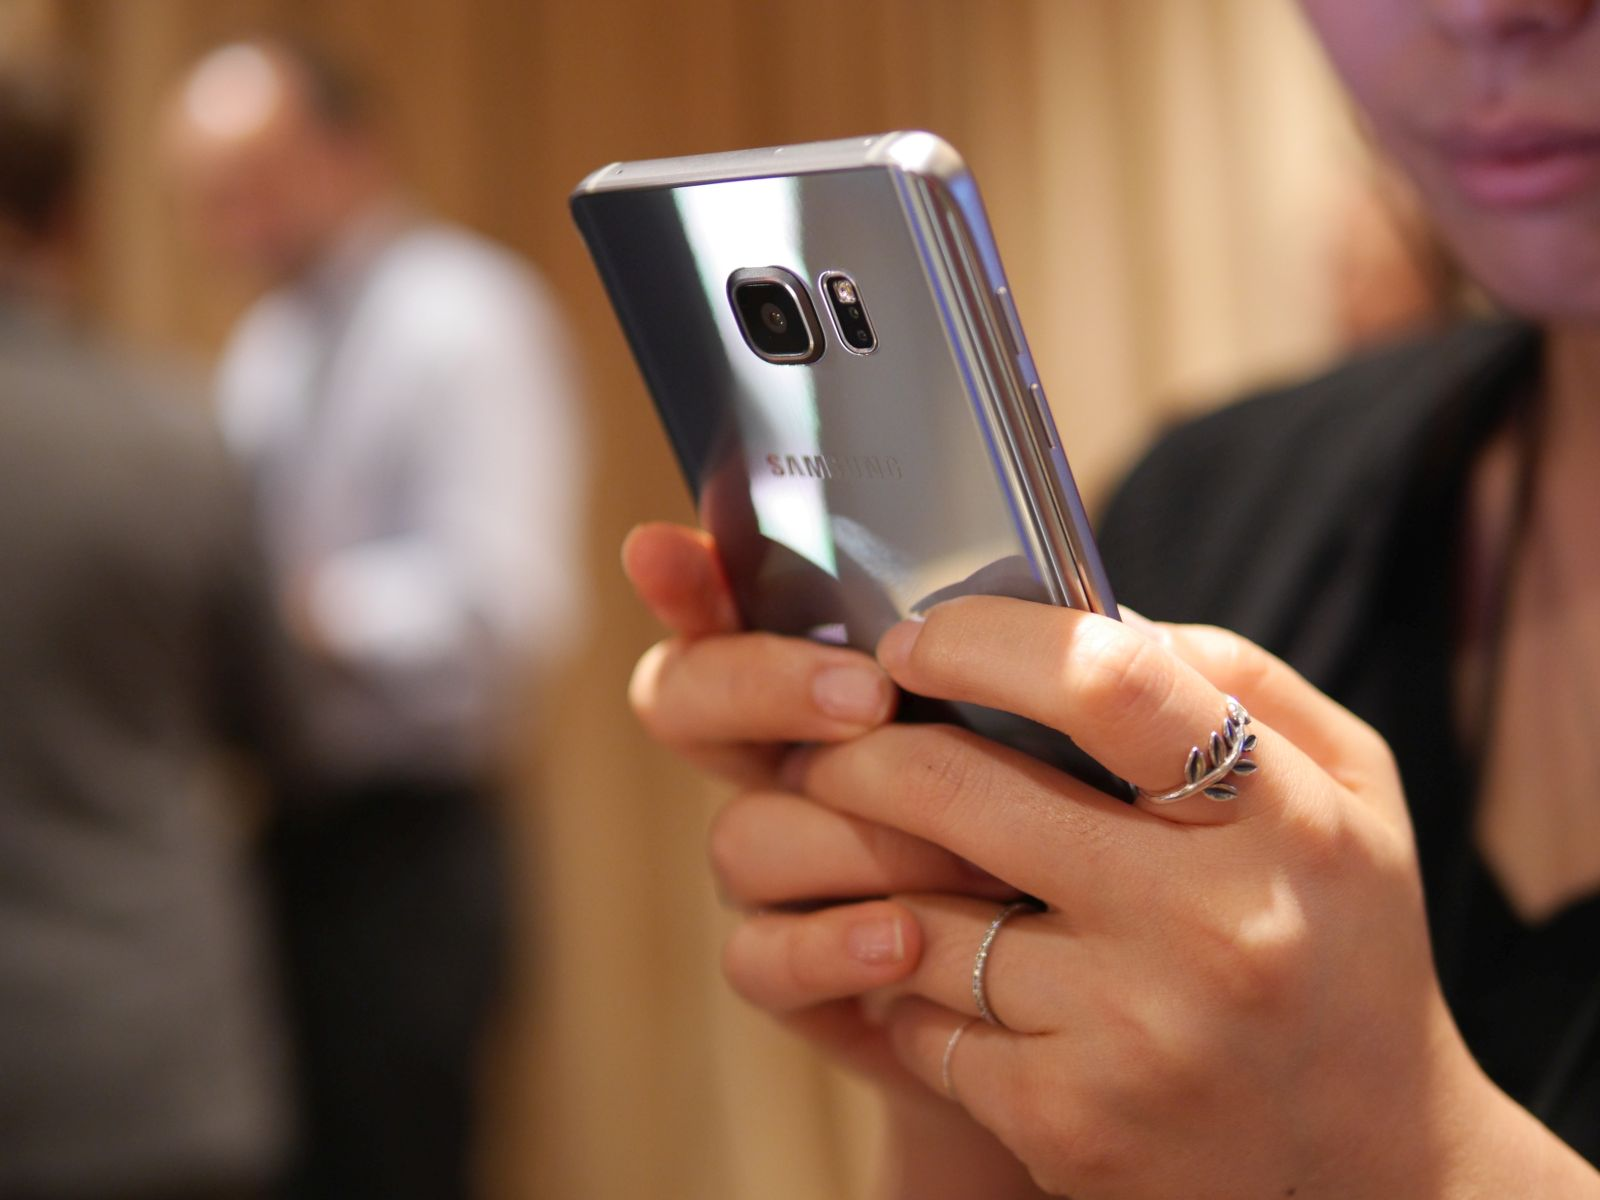 Samsung Galaxy S6 edge Plus 21